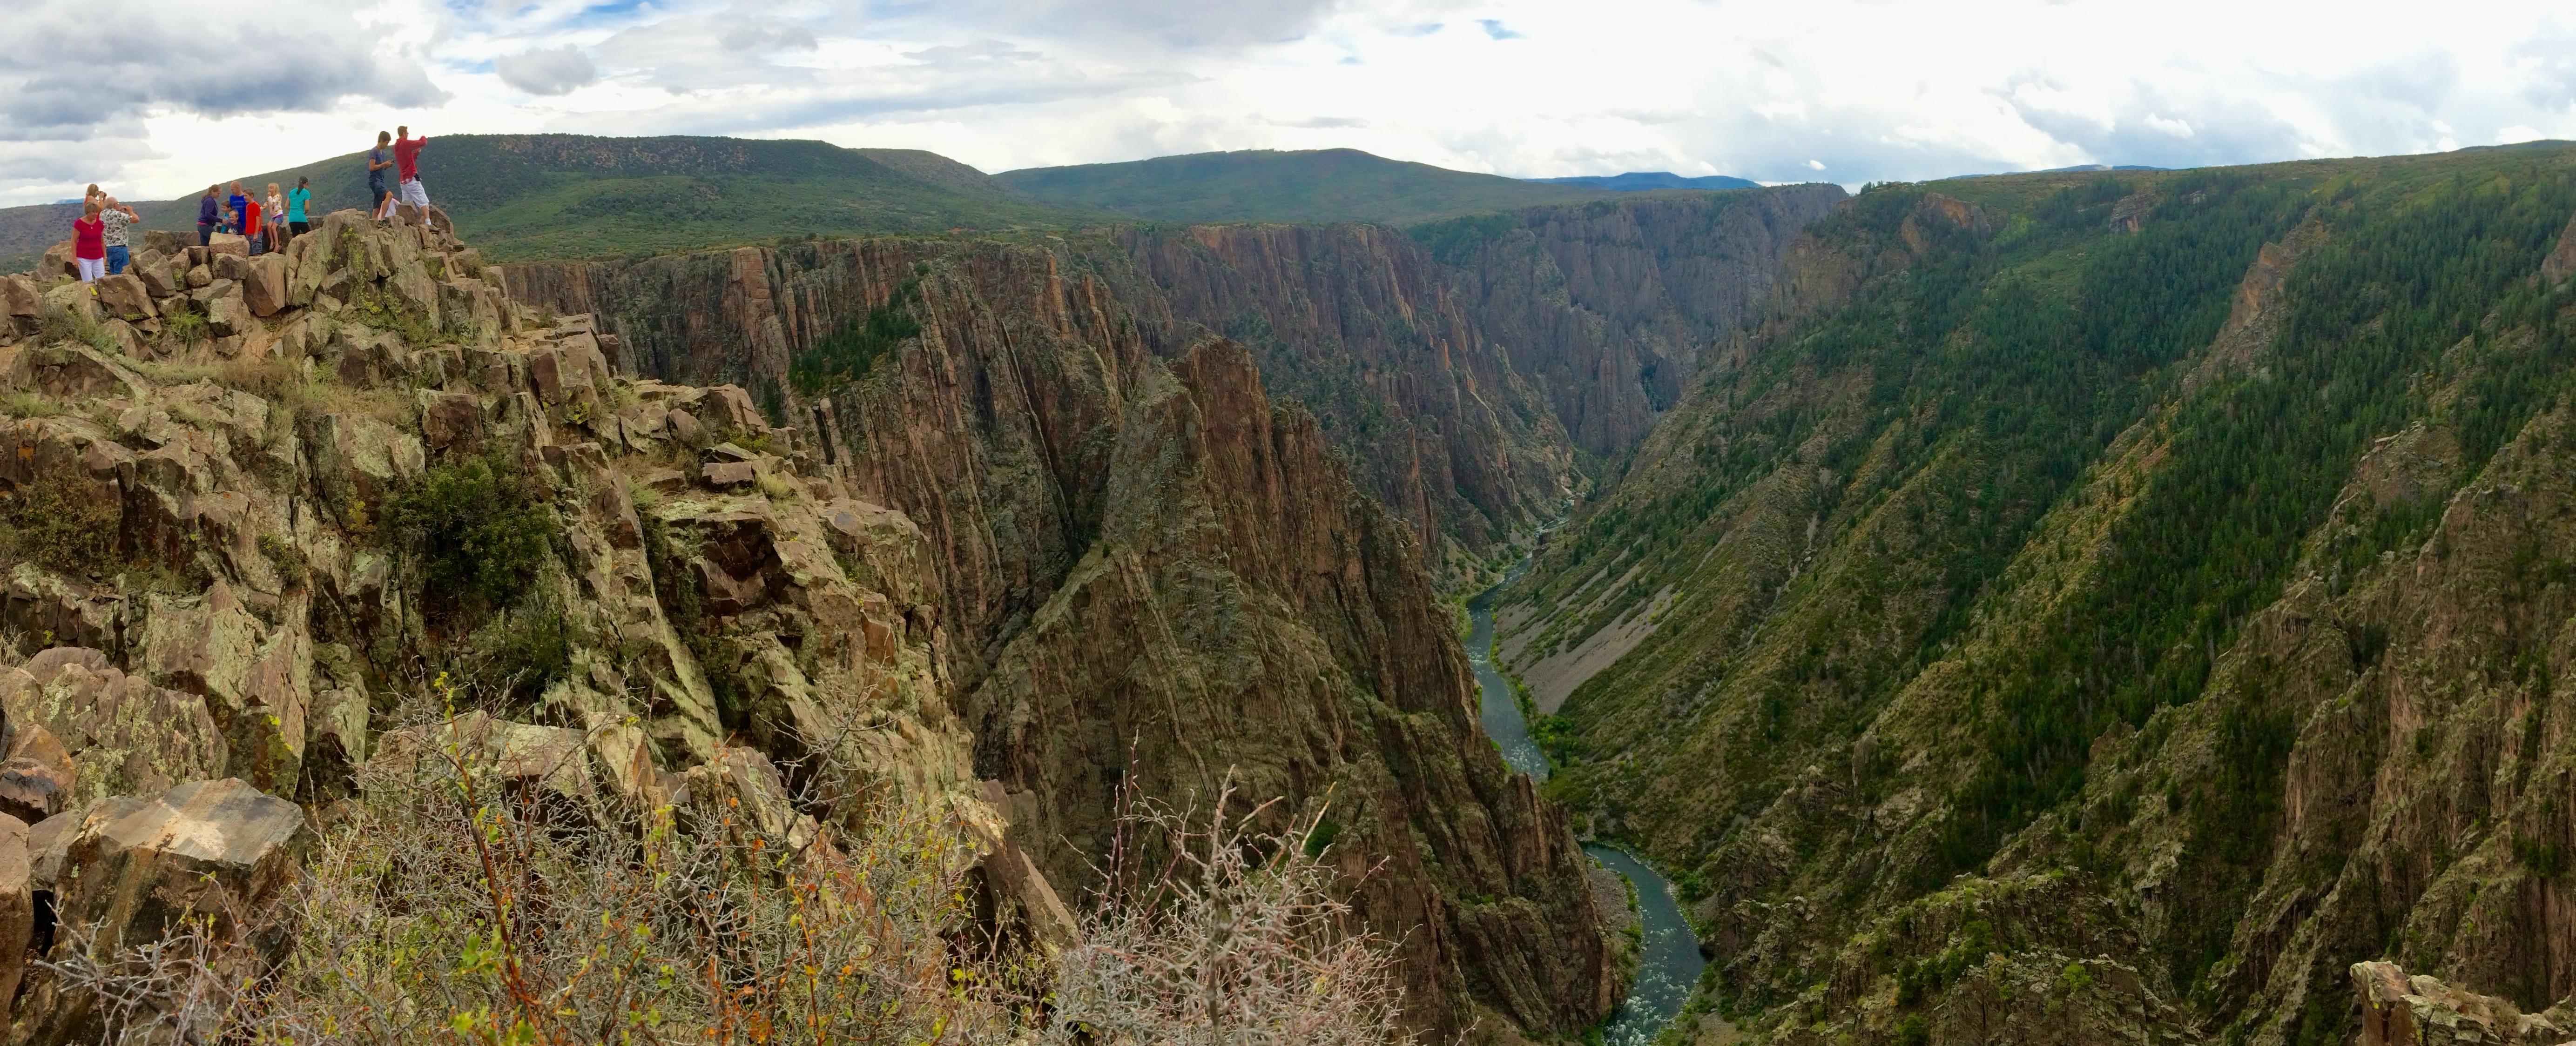 Photo: Black Canyon of the Gunnison Overlook